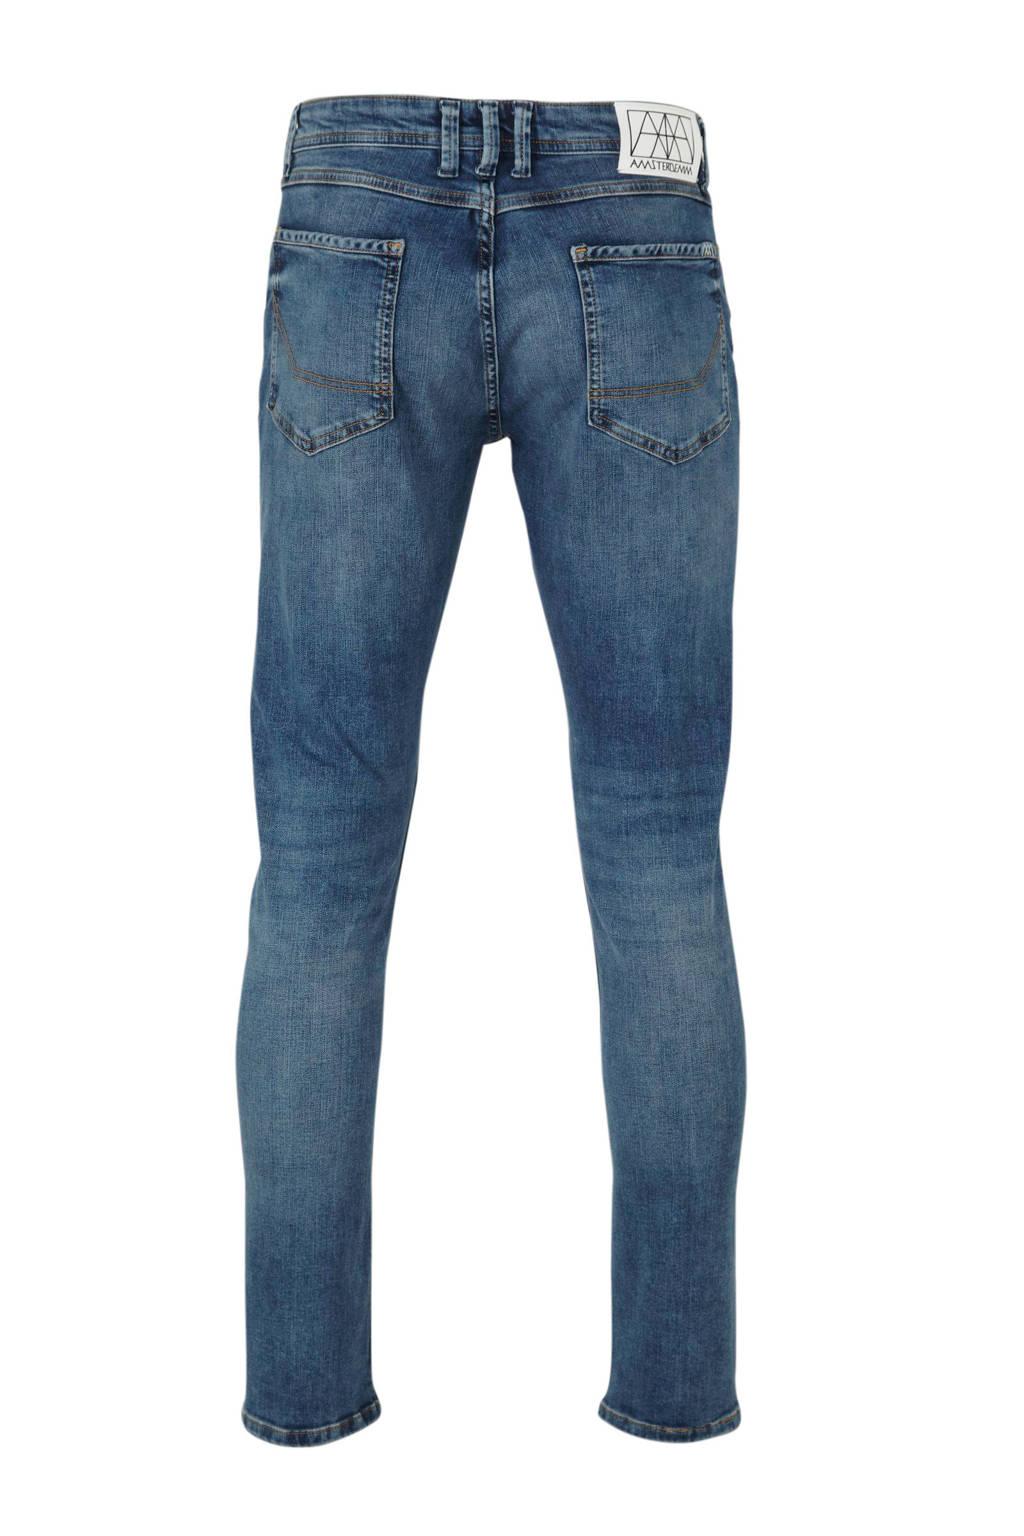 Jan Fit Fit Jeans Jan Jeans Straight Amsterdenim Amsterdenim Amsterdenim Straight SUVpzMq